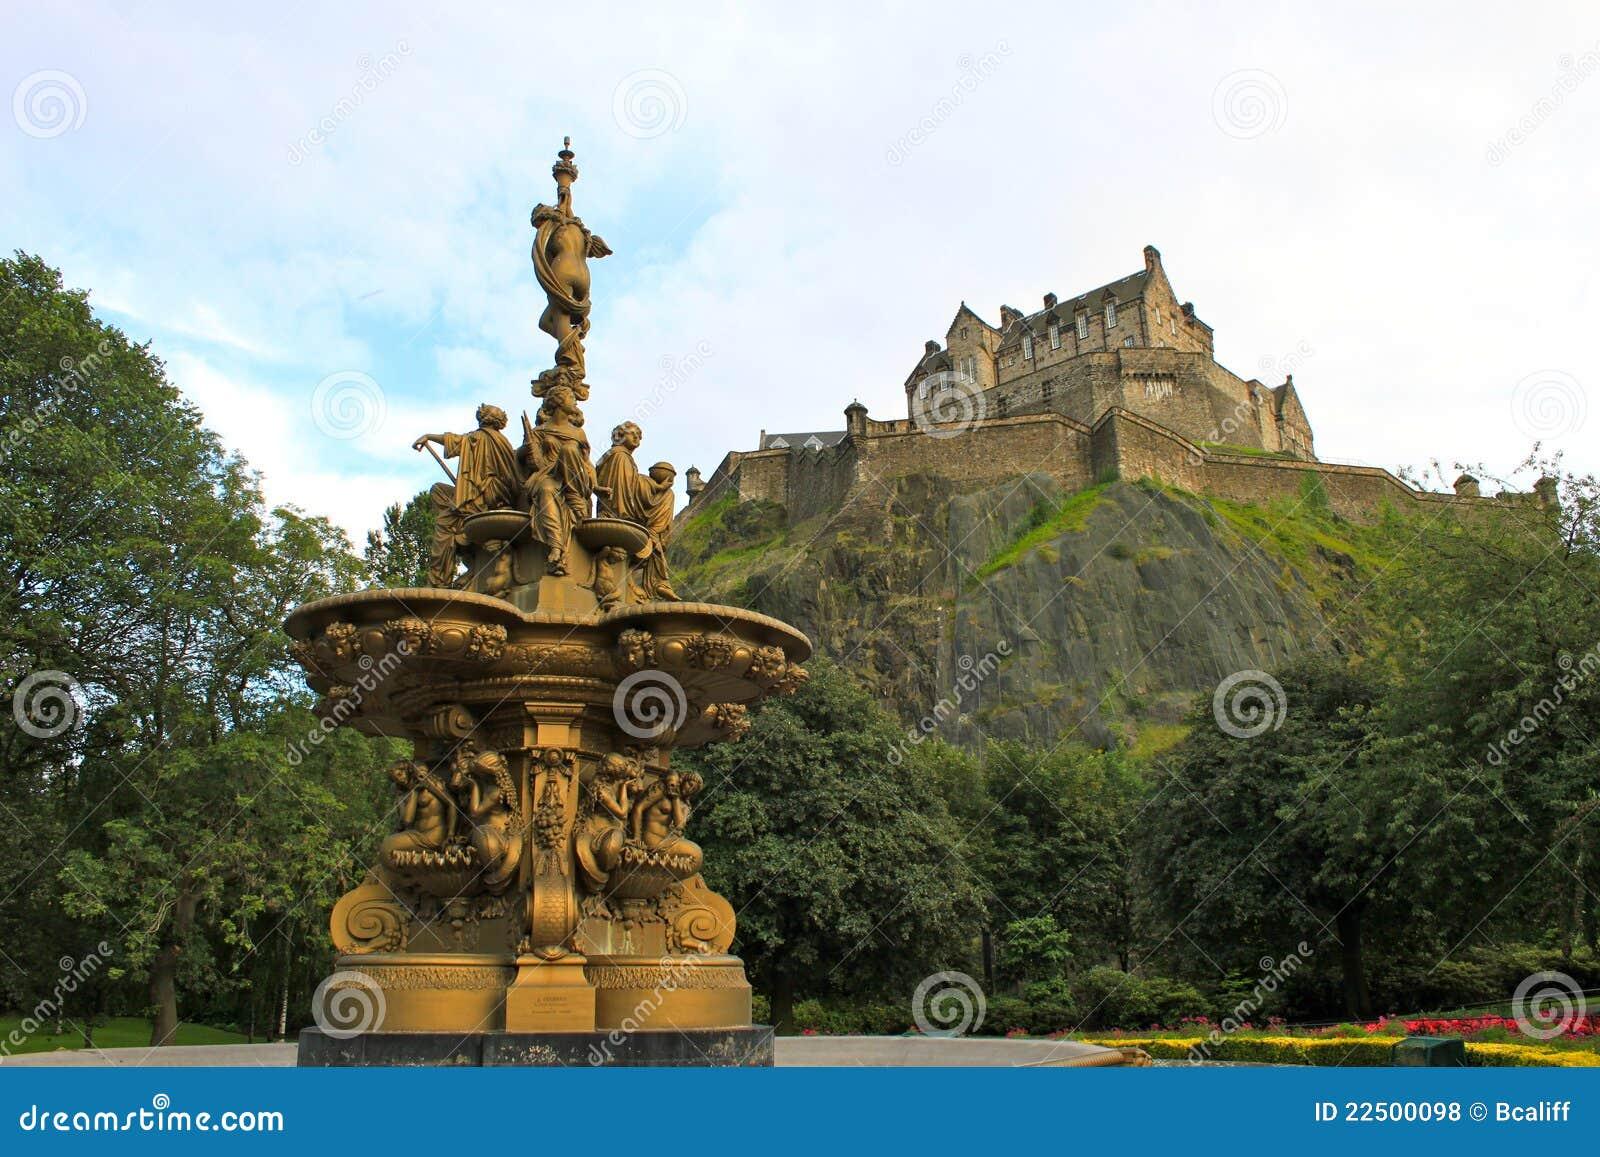 Edinburgh castle fountain